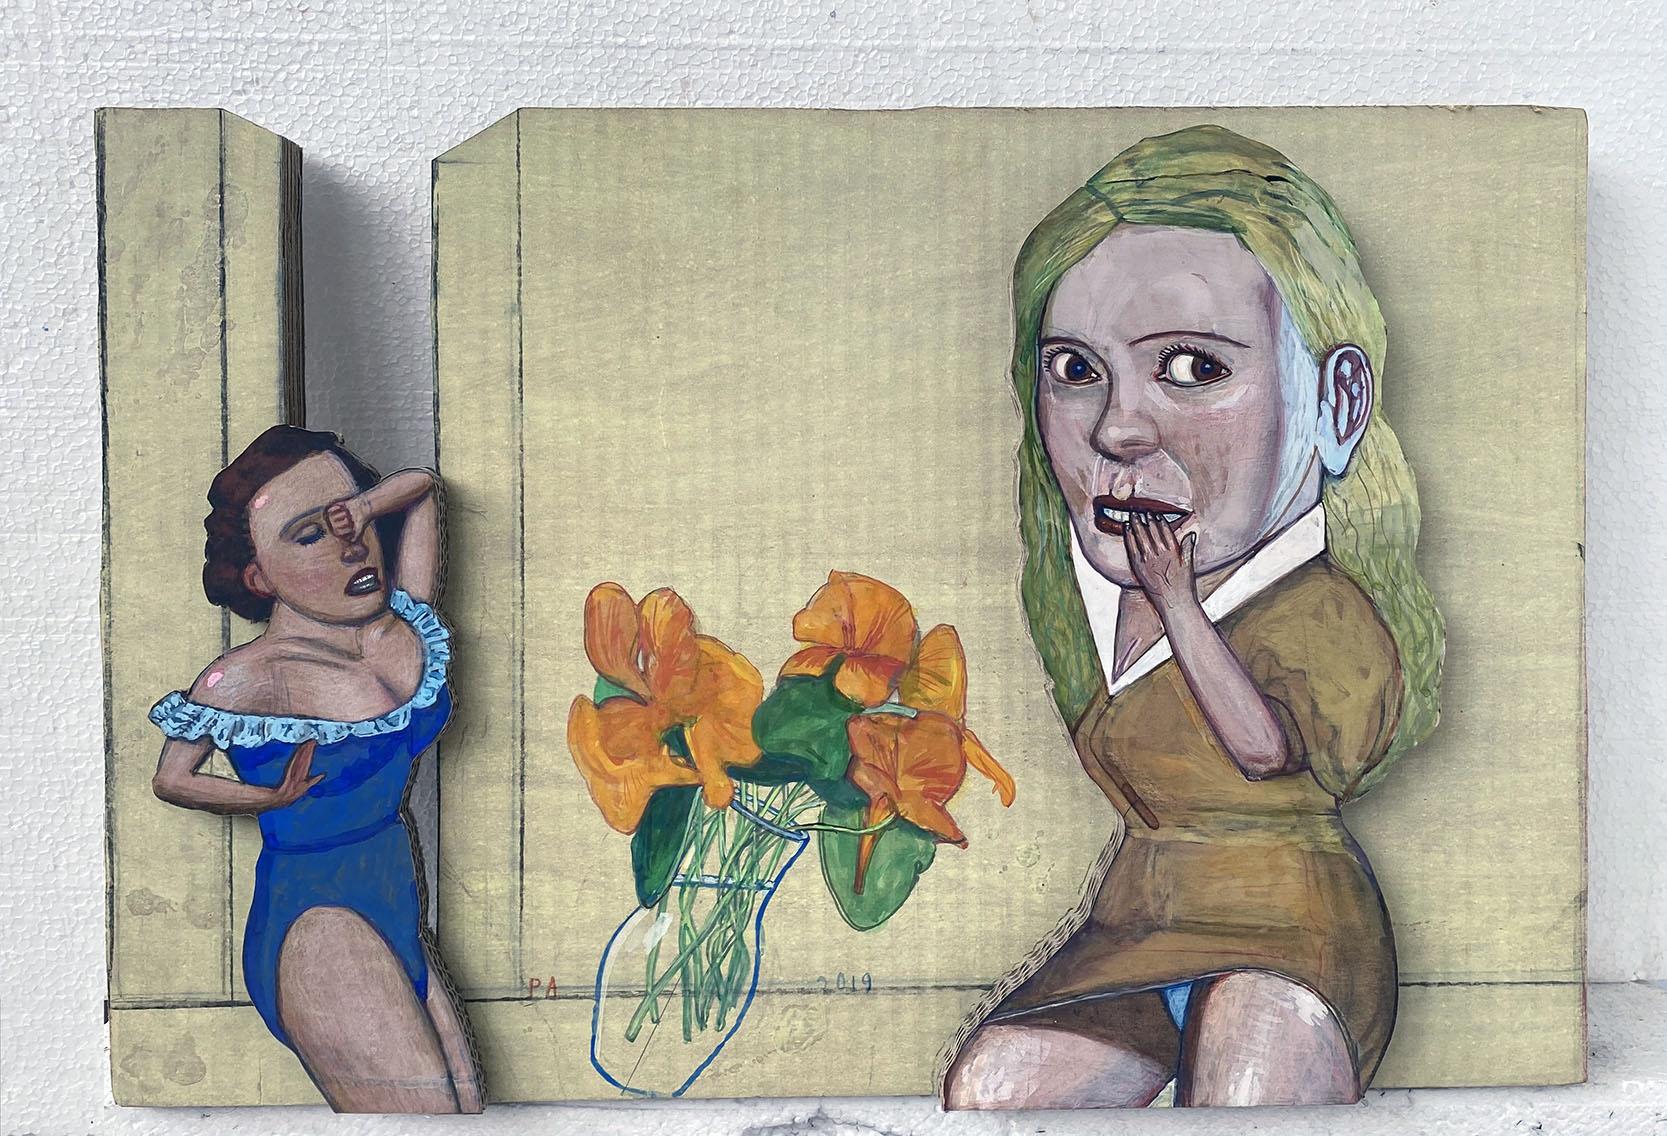 Pat Andrea, Honte et désespoir, mixed media on carton, 60 x 40 x 6 cm, 2020